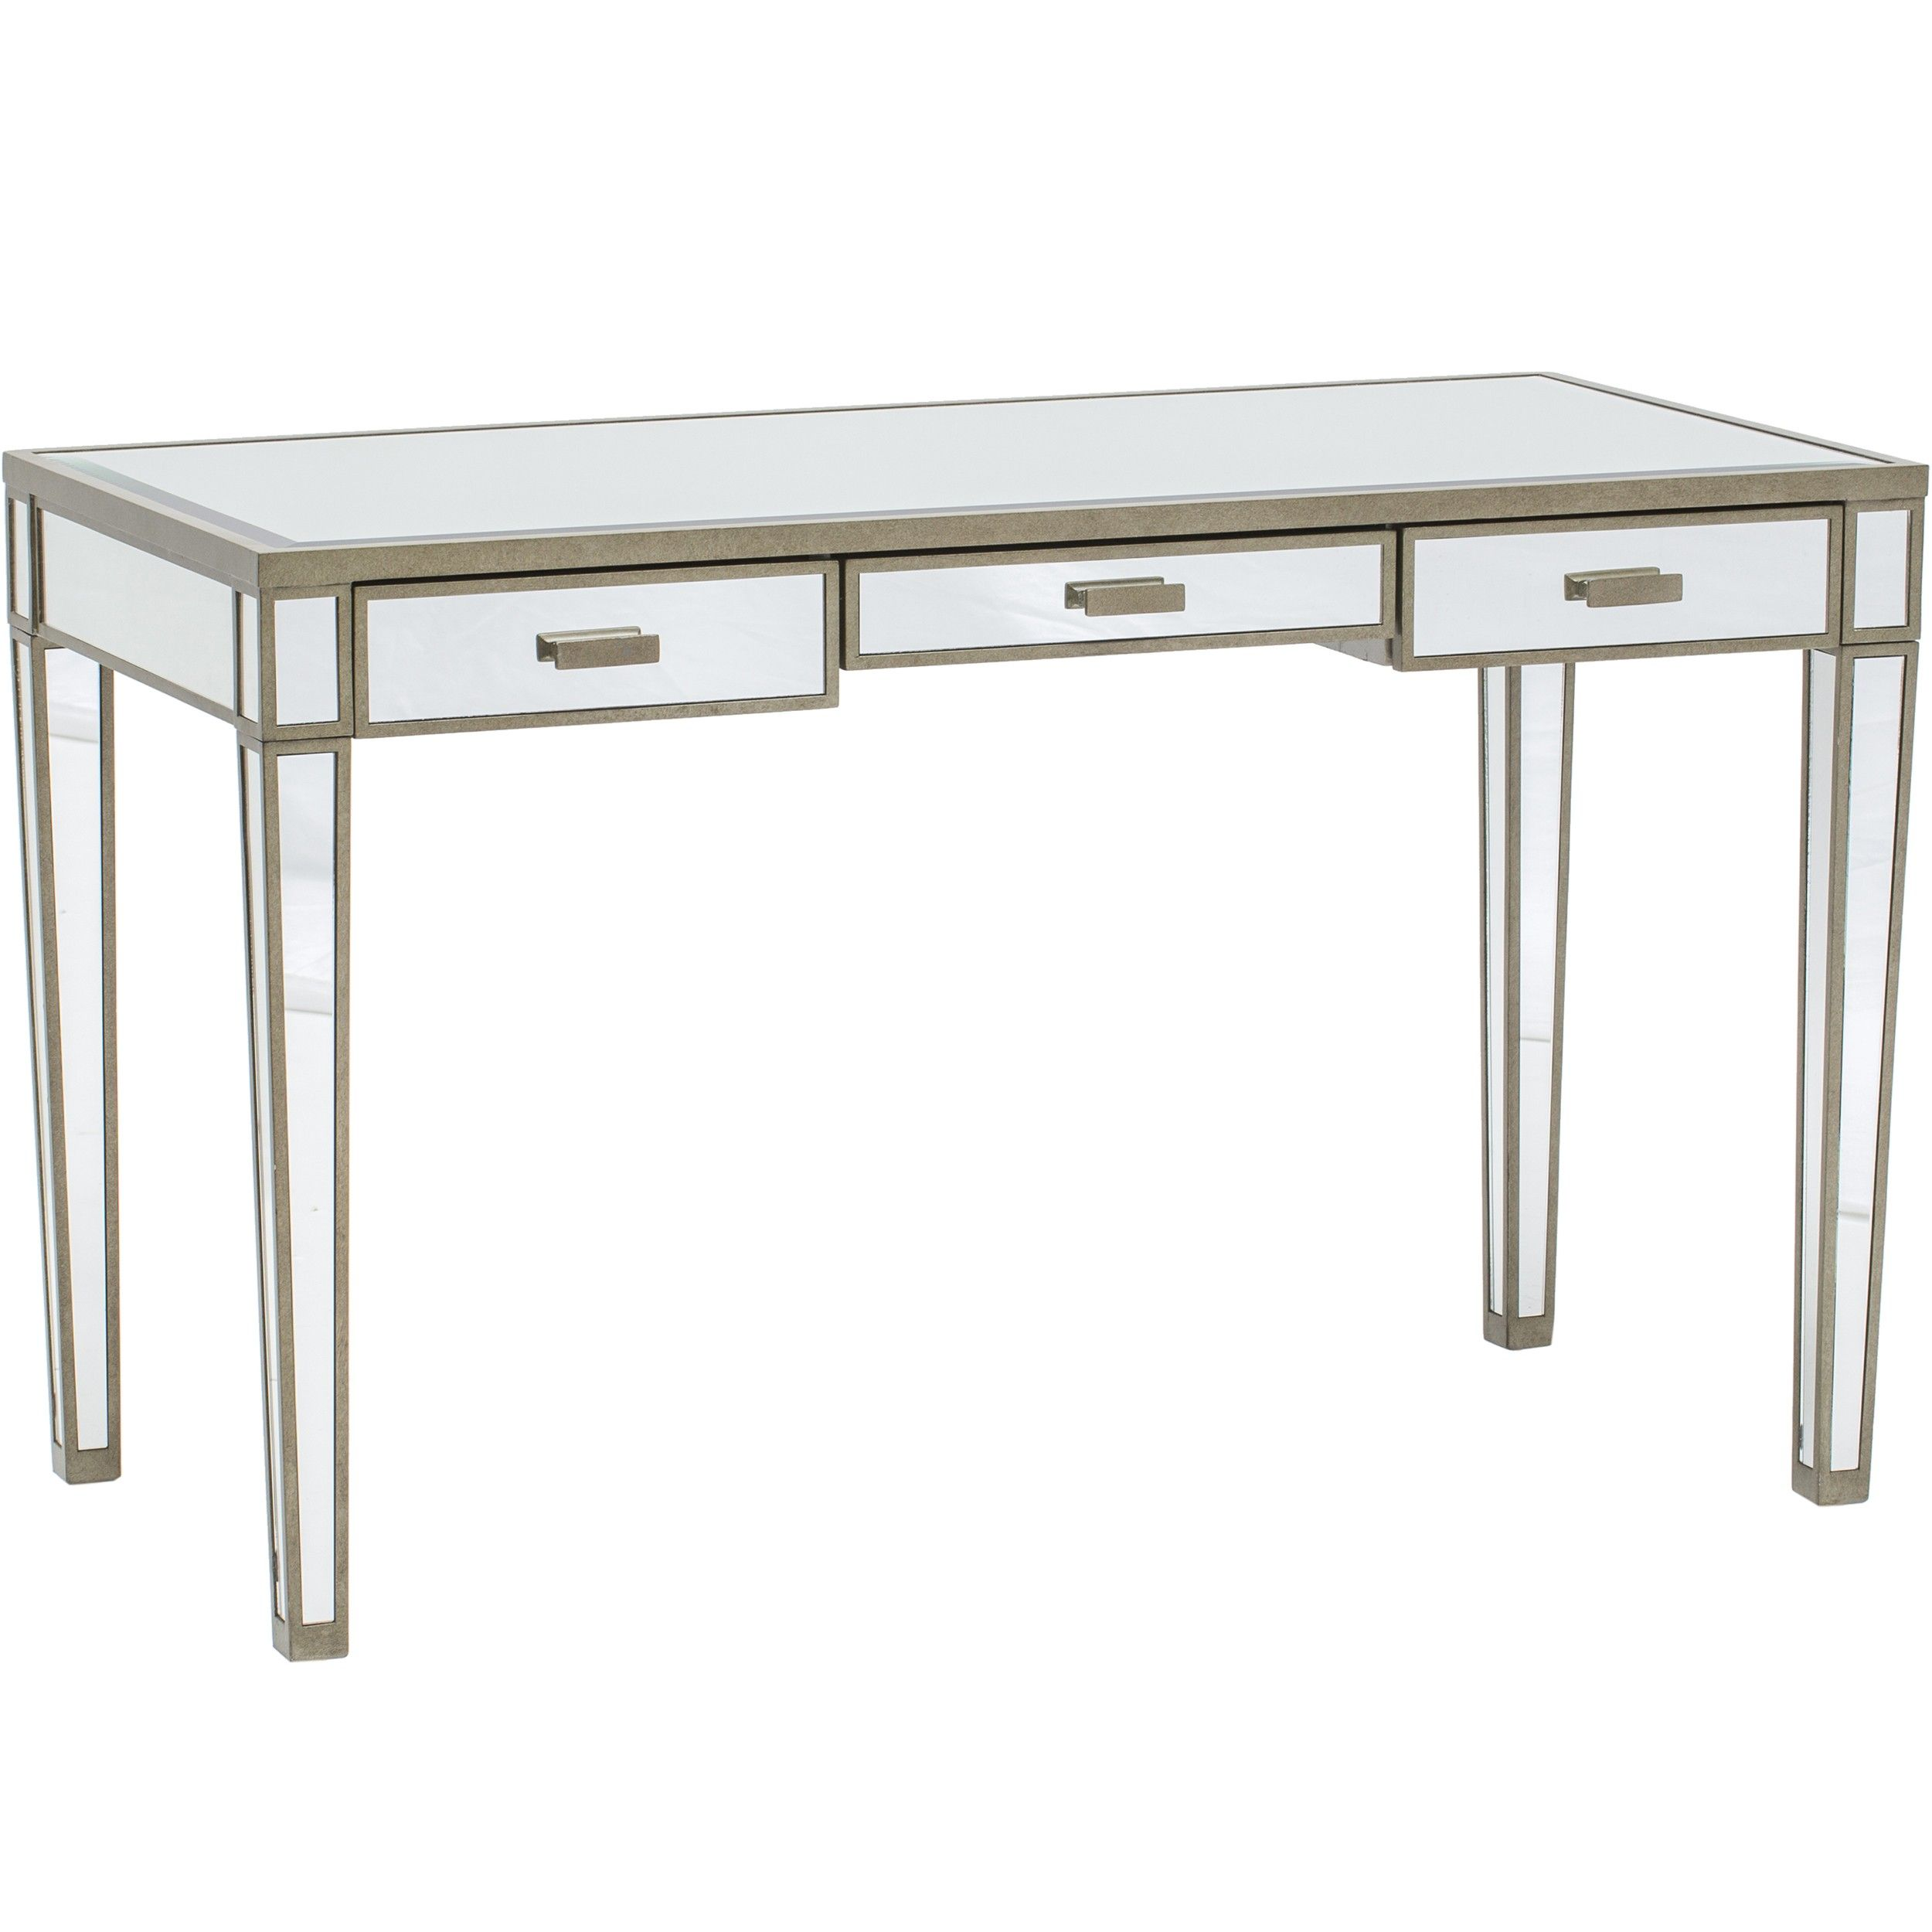 com hair desk bathroom dressing set home makeup vanity mirror organizer white kitchen amazon table tri dp